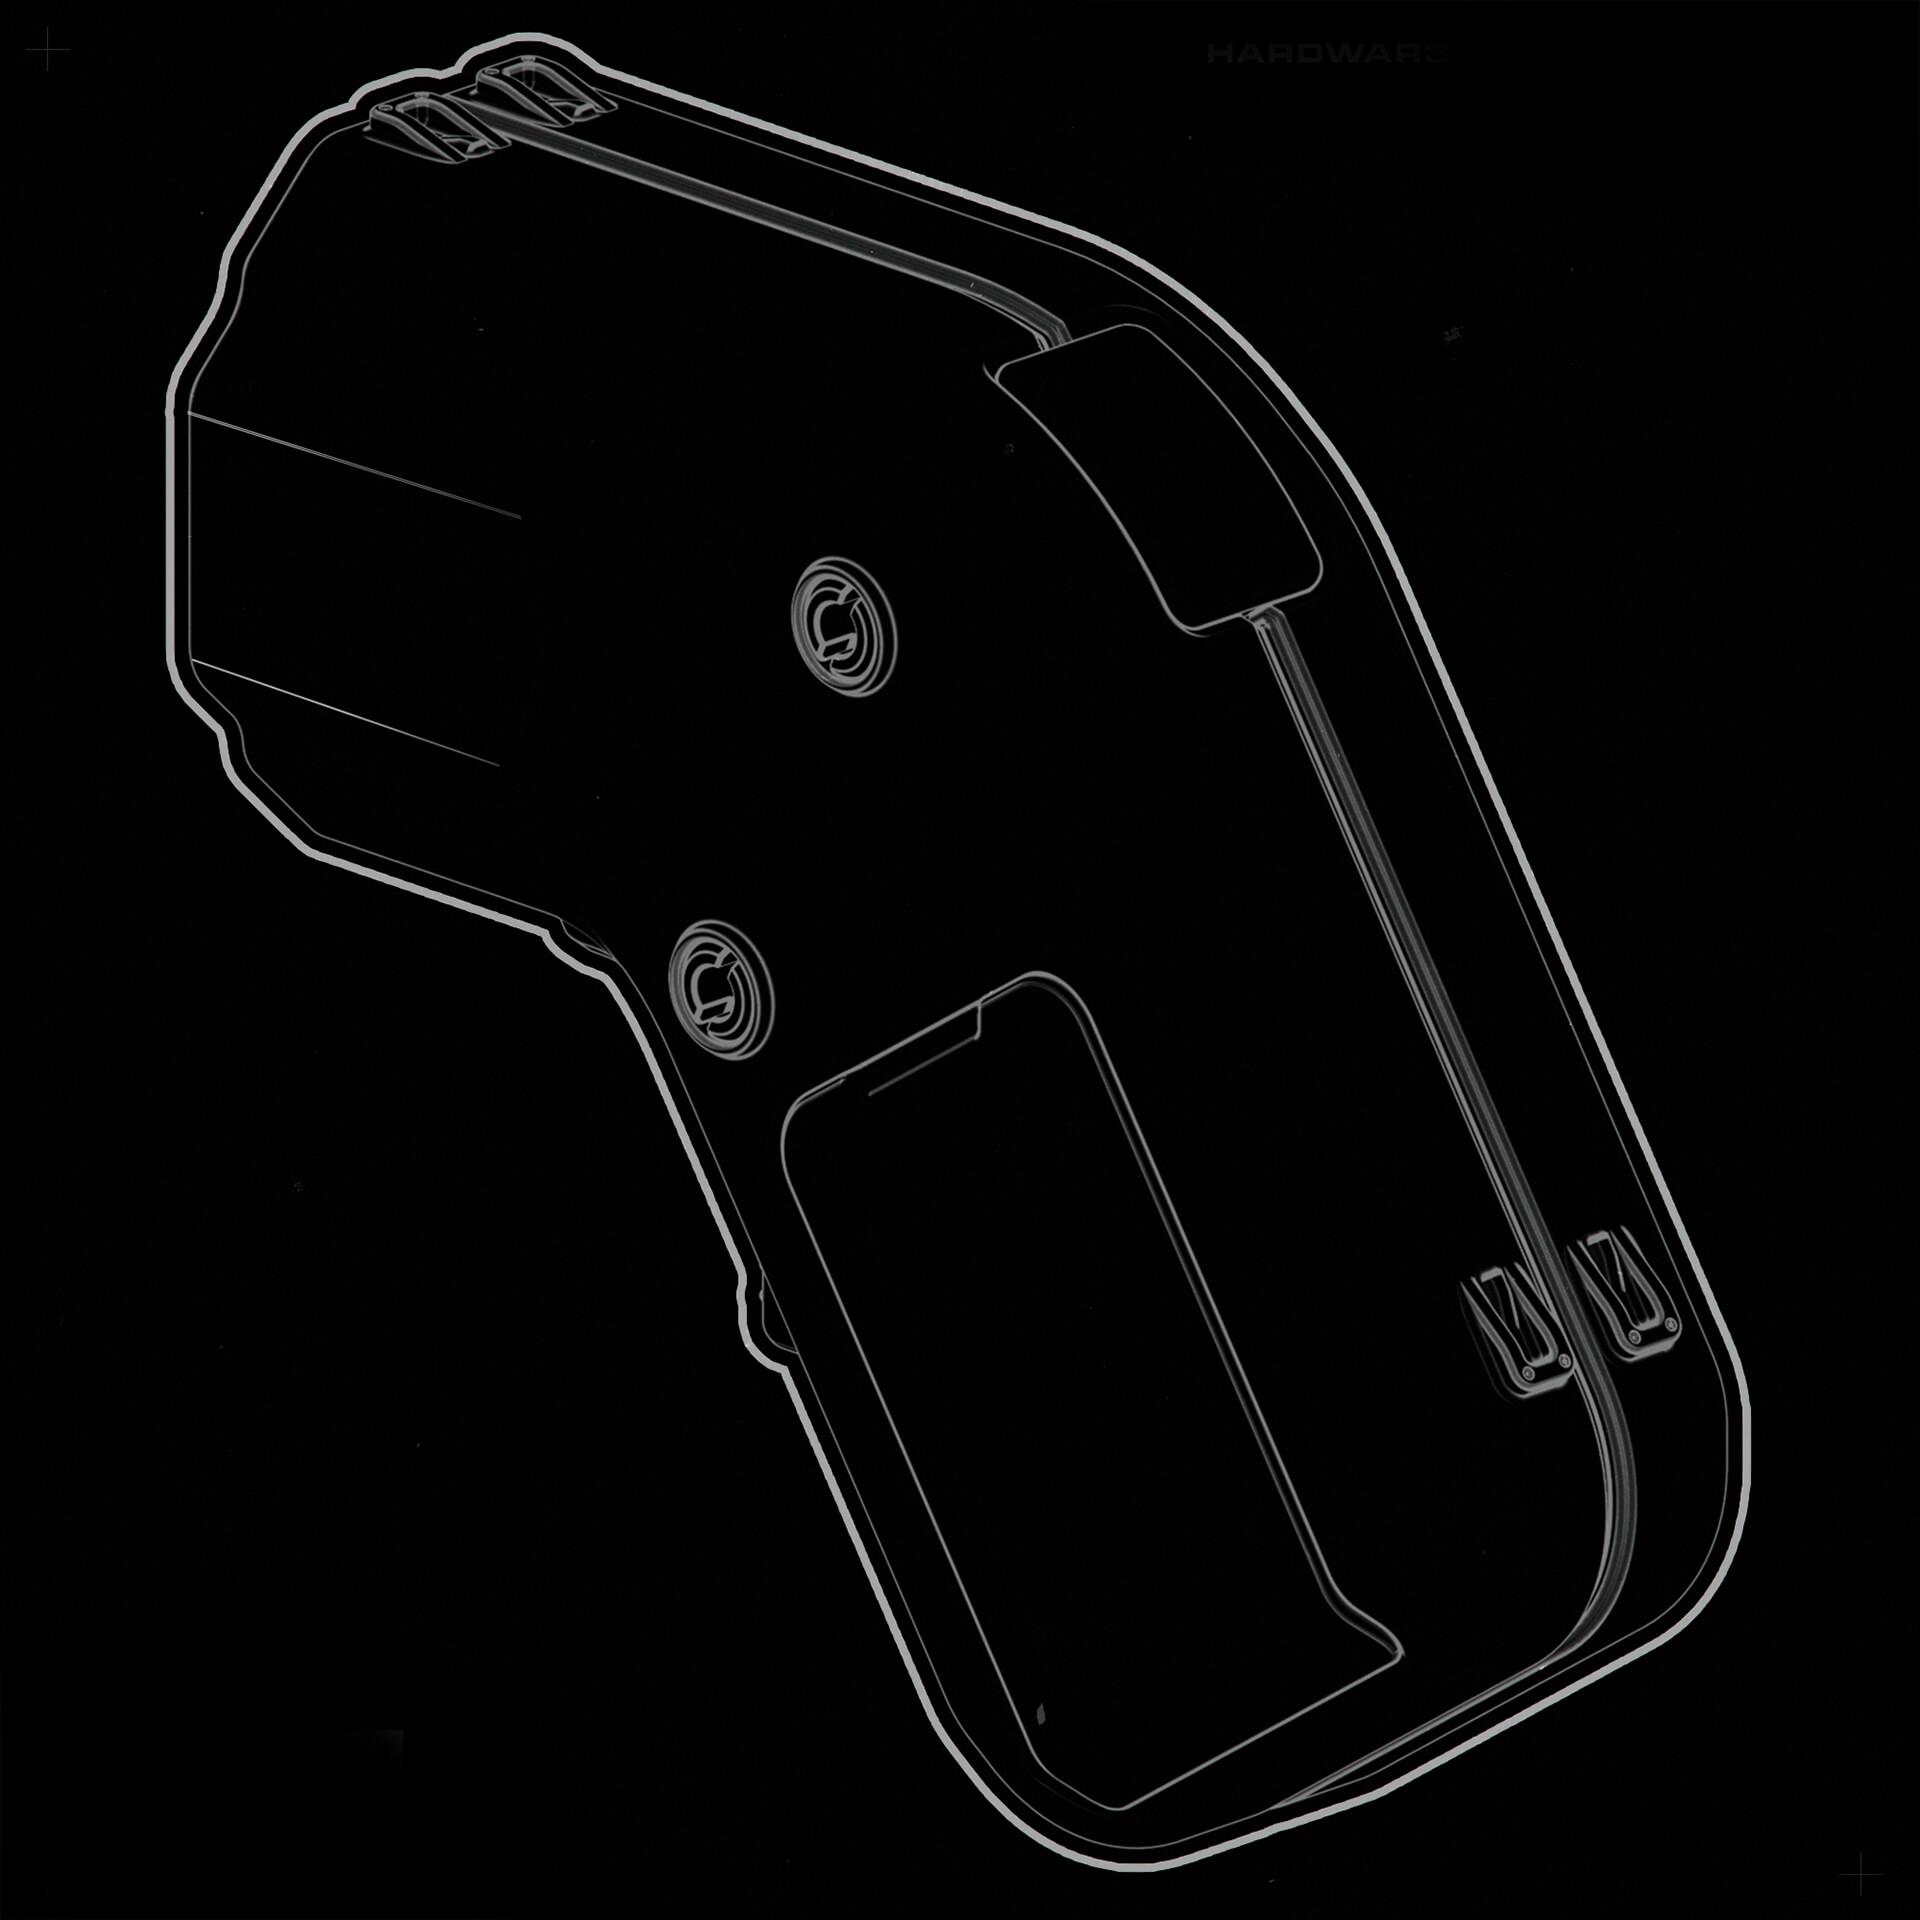 Scanner-001.48b-Back-Clean